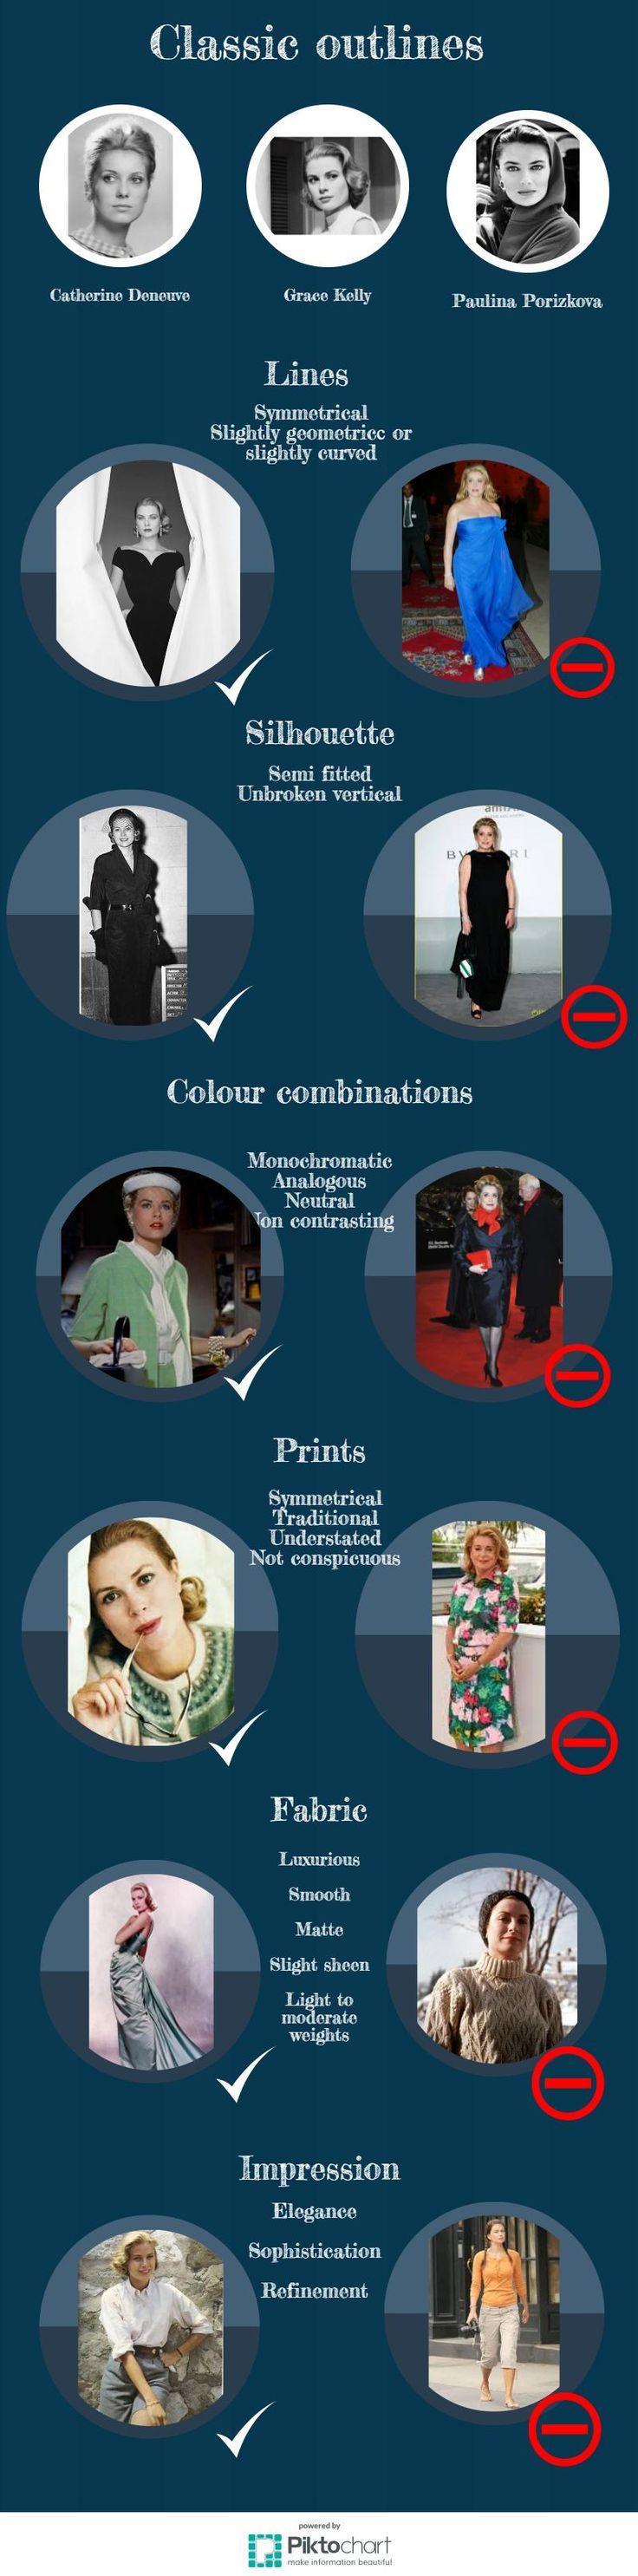 Classic outlines, Kibbe, Grace Kelly, Catherine Deneuve, Paulina Porizkova